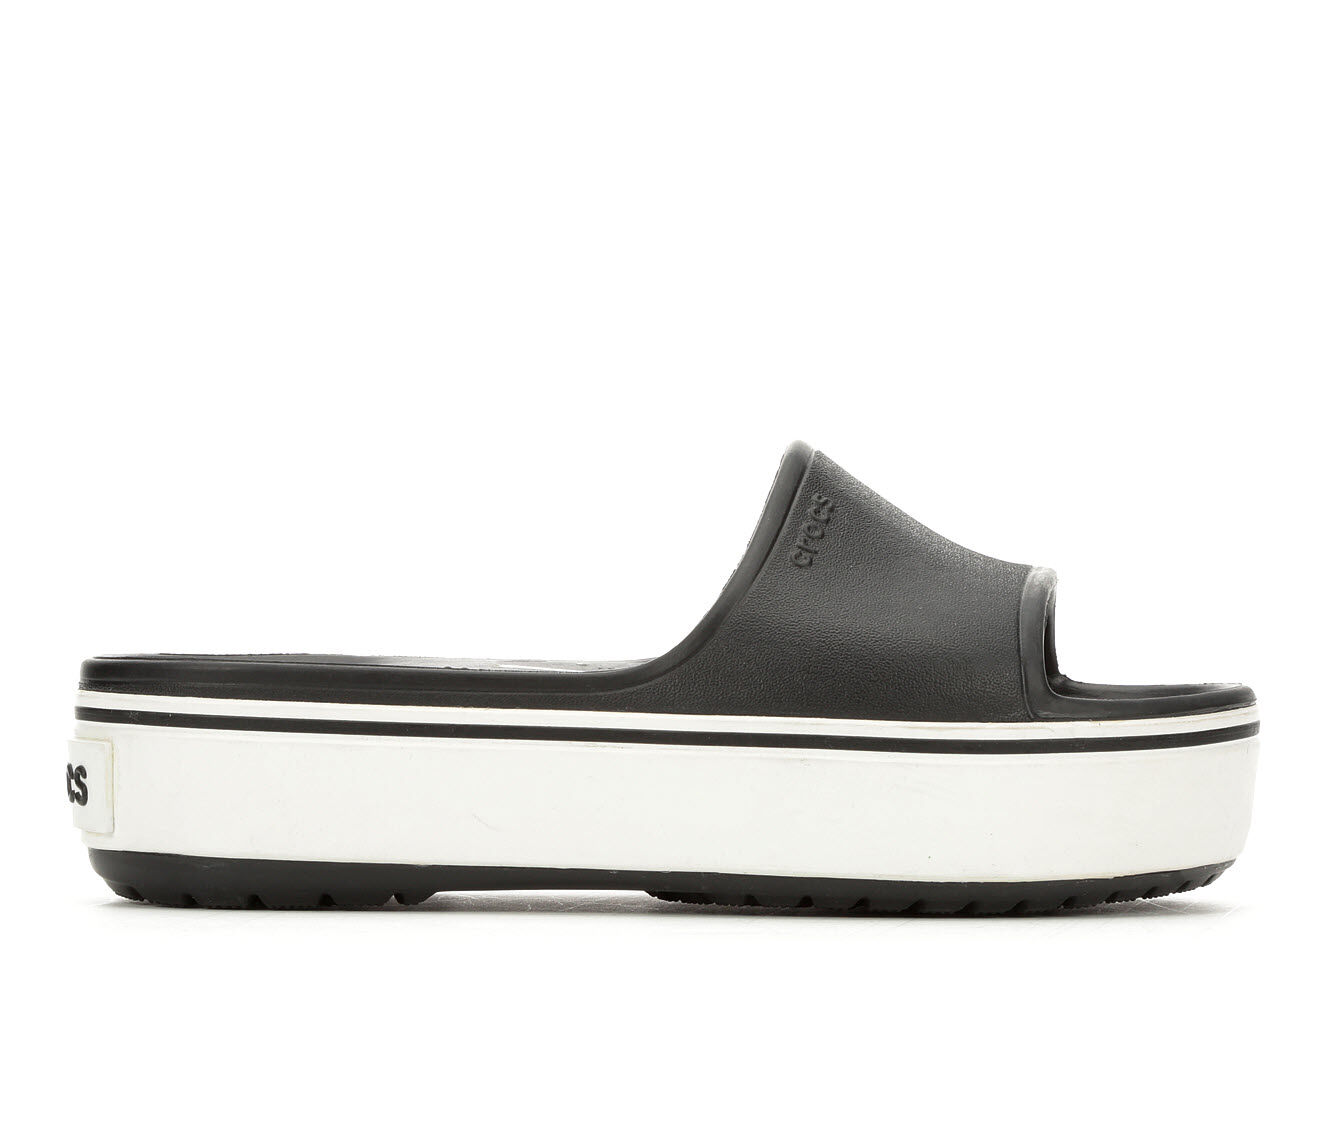 Unique Women's Crocs Crocband Platform Sl Flatform Slides Black/White